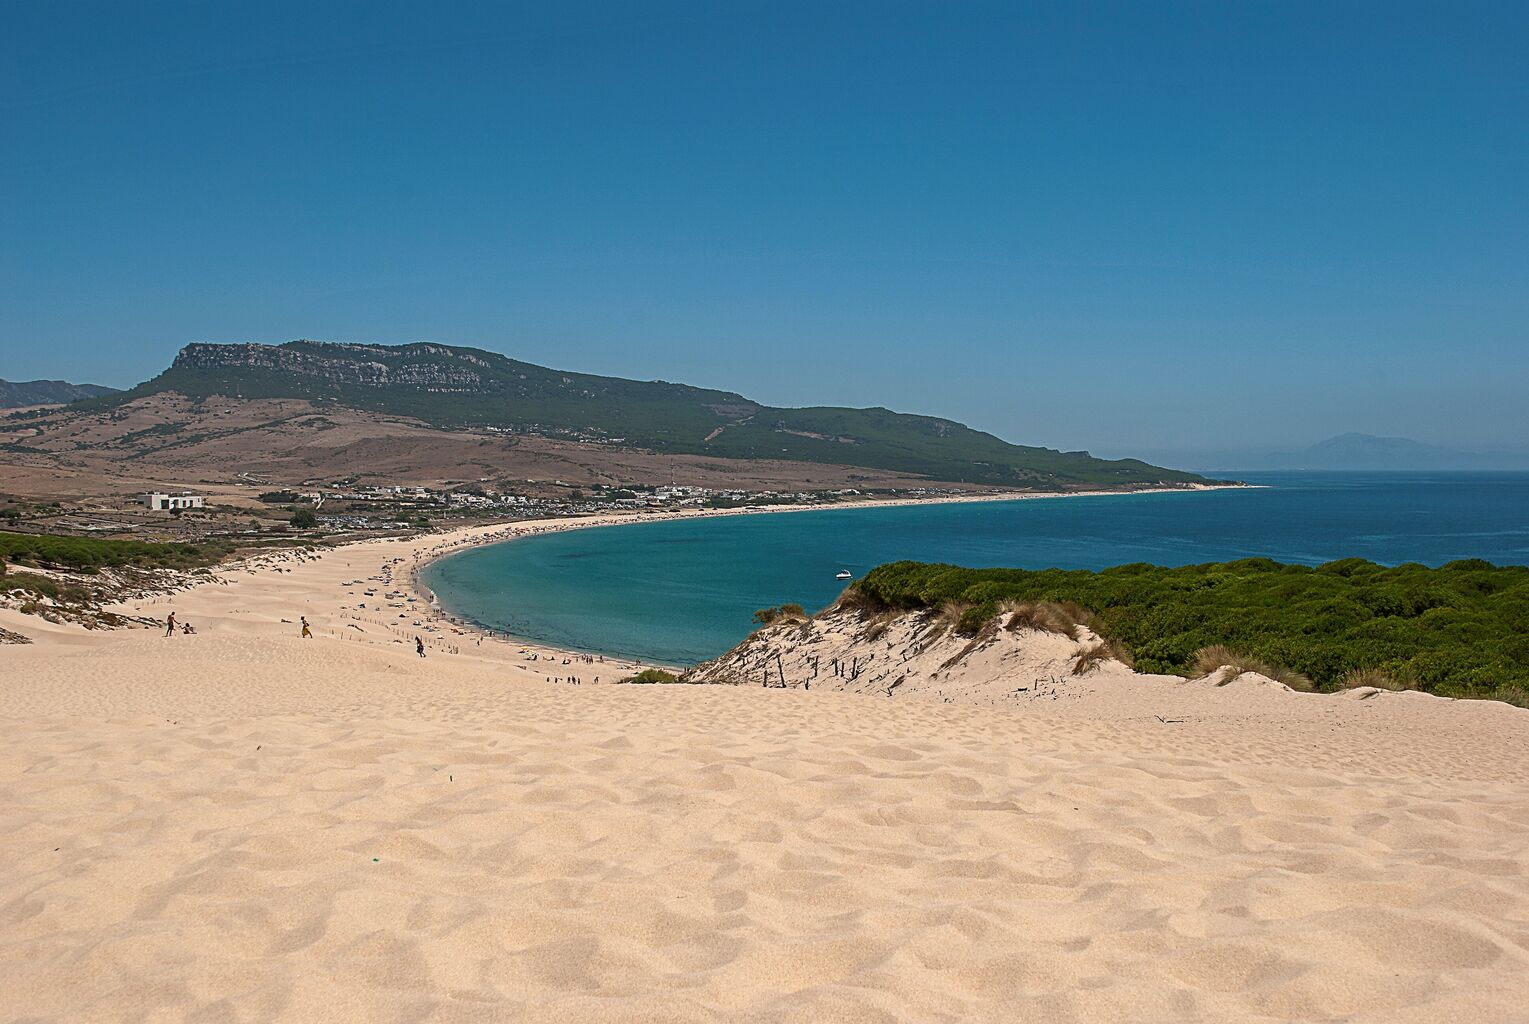 Resultado de imagen de playa bolonia kitesurf